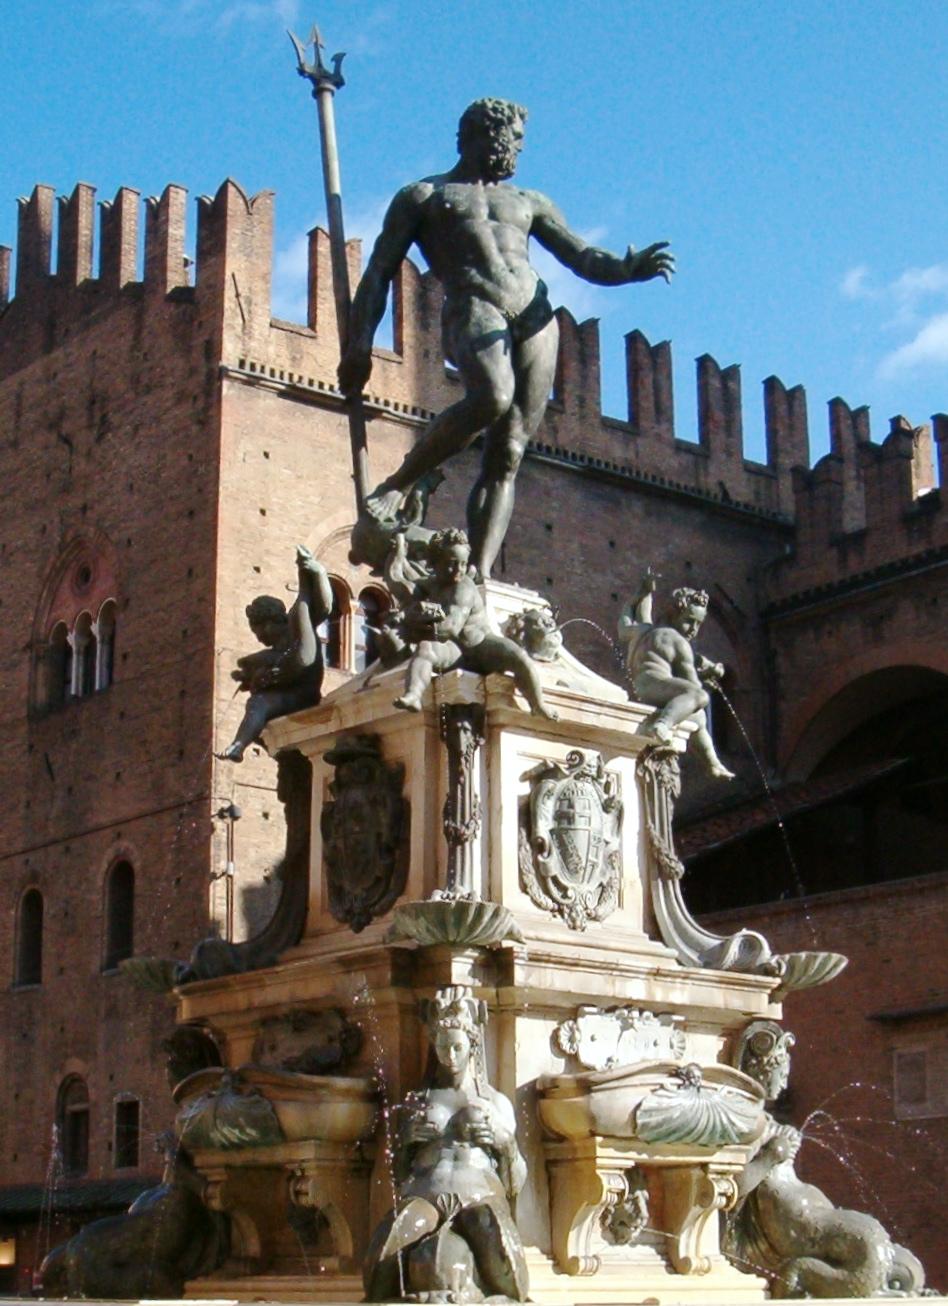 File:Bologna fontana del Nettuno 07feb08 02.jpg